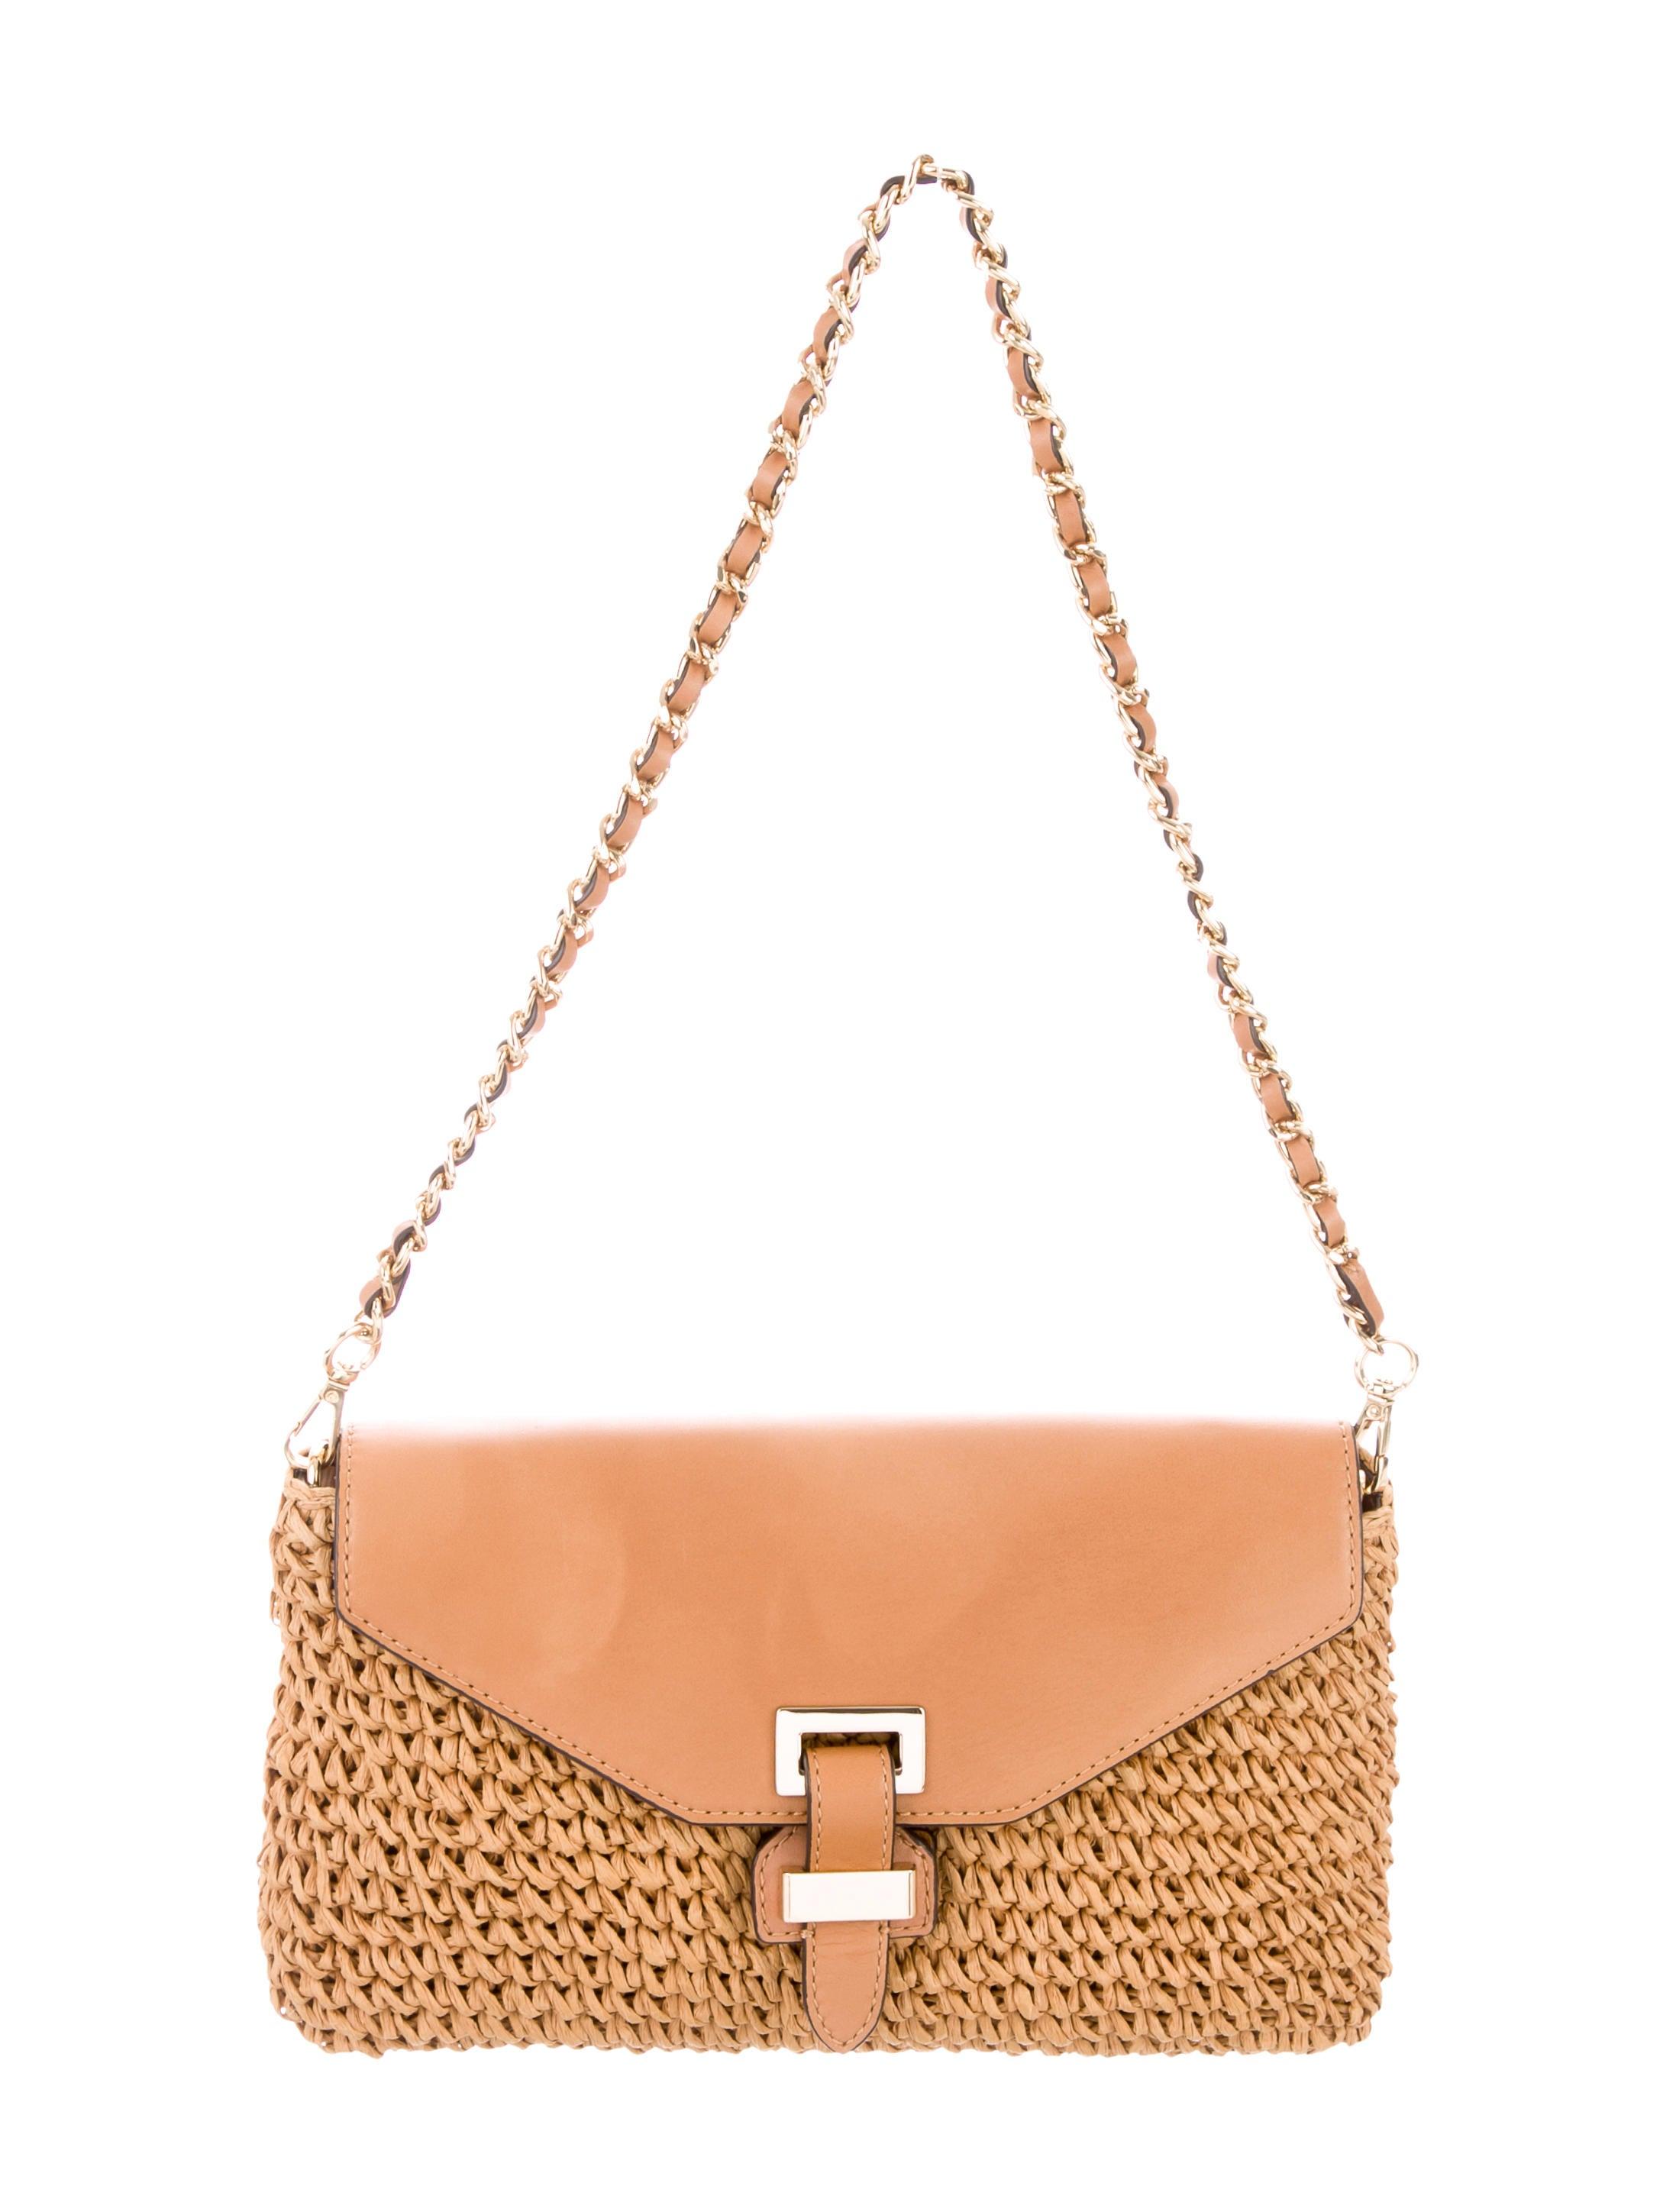 a74f39dad933 Michael Michael Kors Leather-Trimmed Raffia Bag - Handbags ...